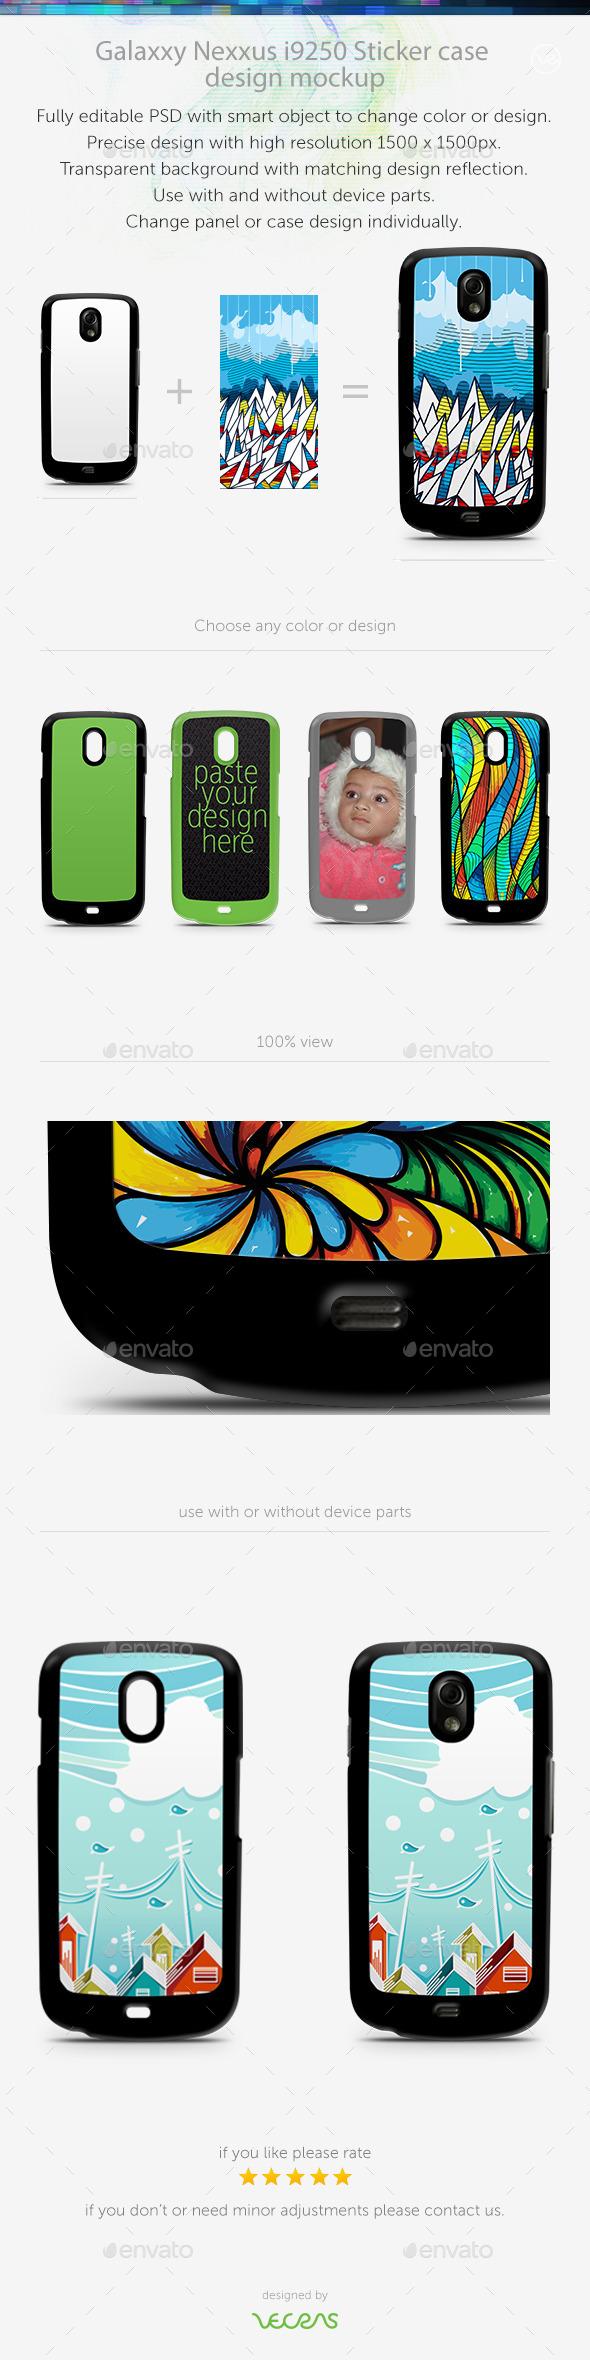 Galaxxy Nexus i9250 Sticker Case Design Mockup